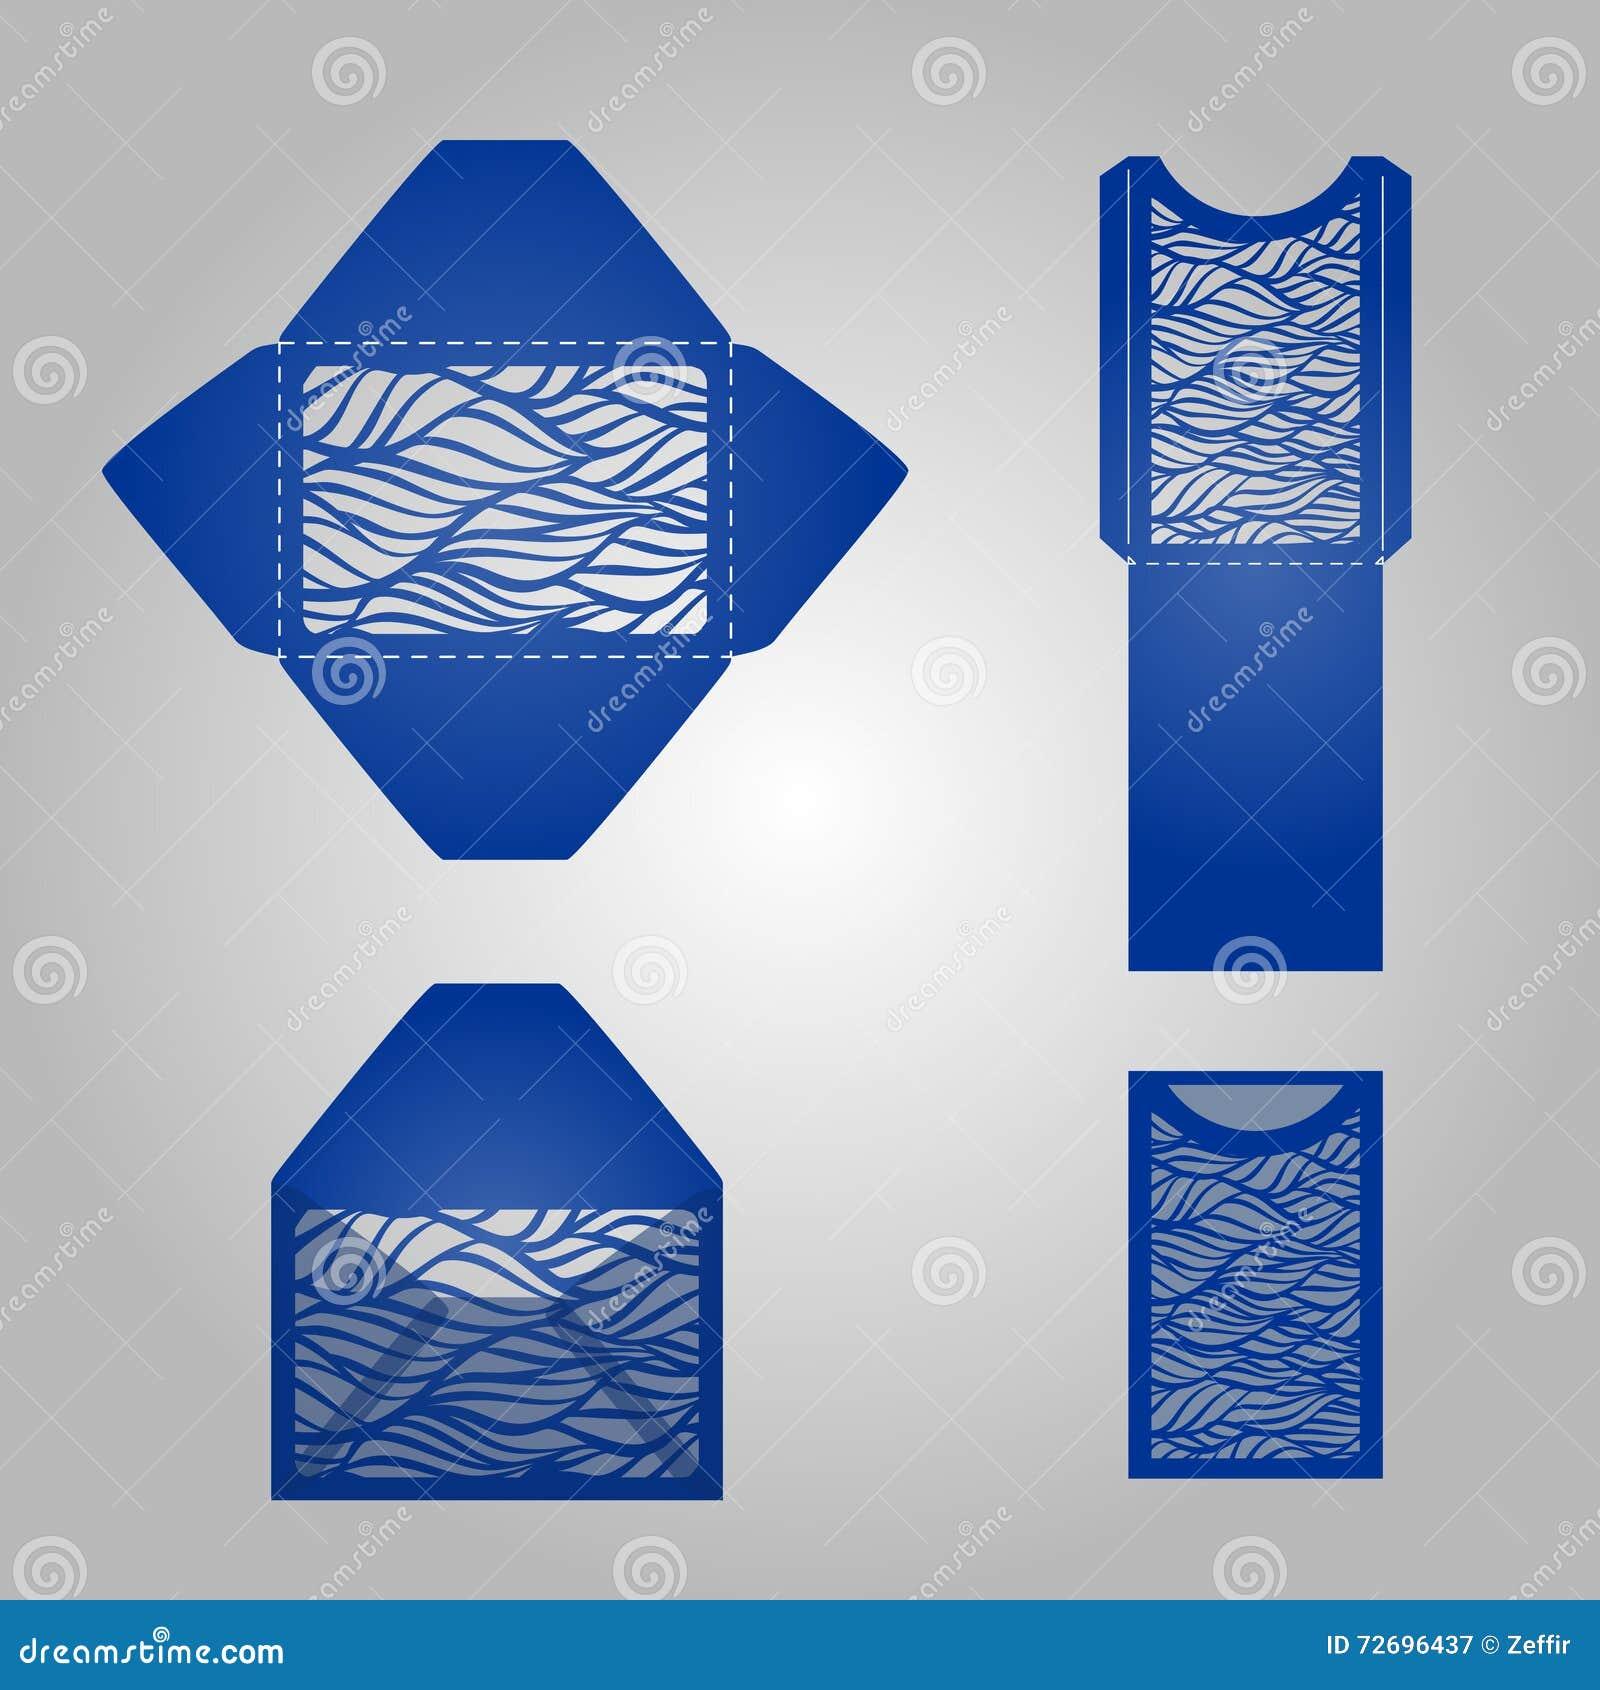 Square Laser Cut Envelope Template Stock Illustration - Illustration ...